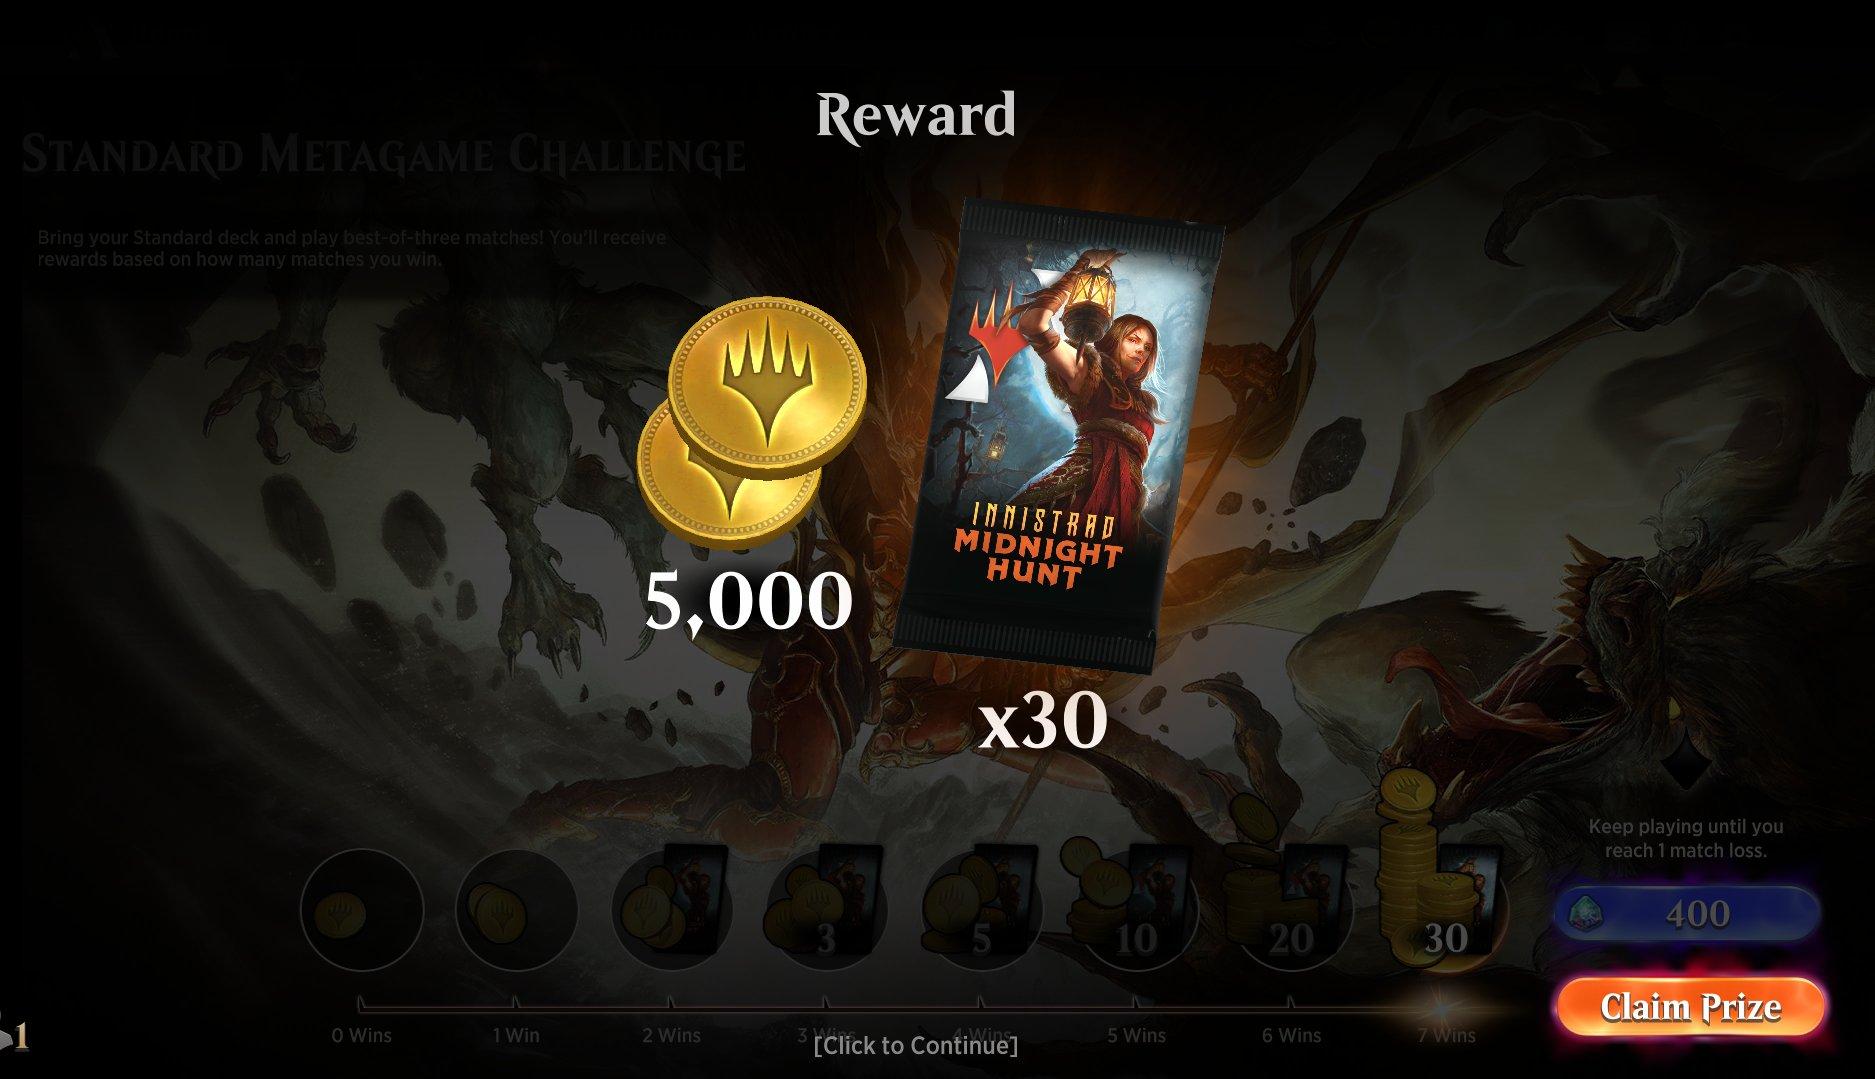 Standard Metagame Challenge - Innistrad Midnight Hunt